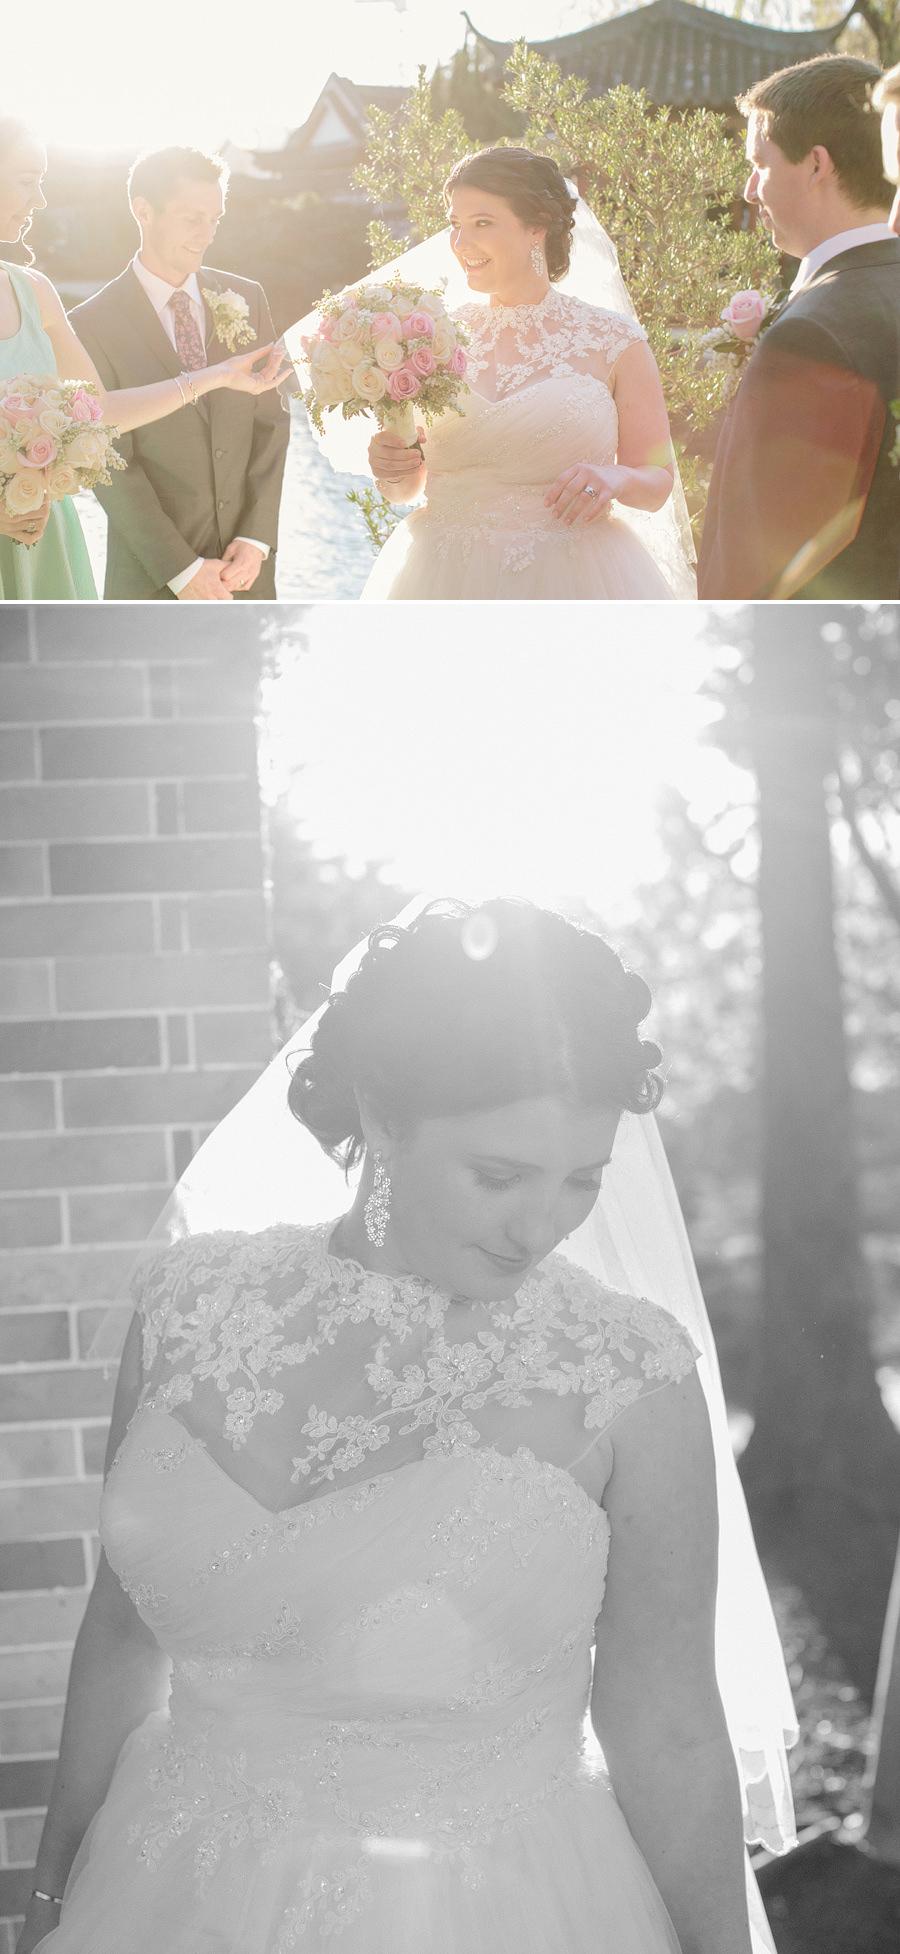 Sydney Wedding Photographers: Bridal party portraits